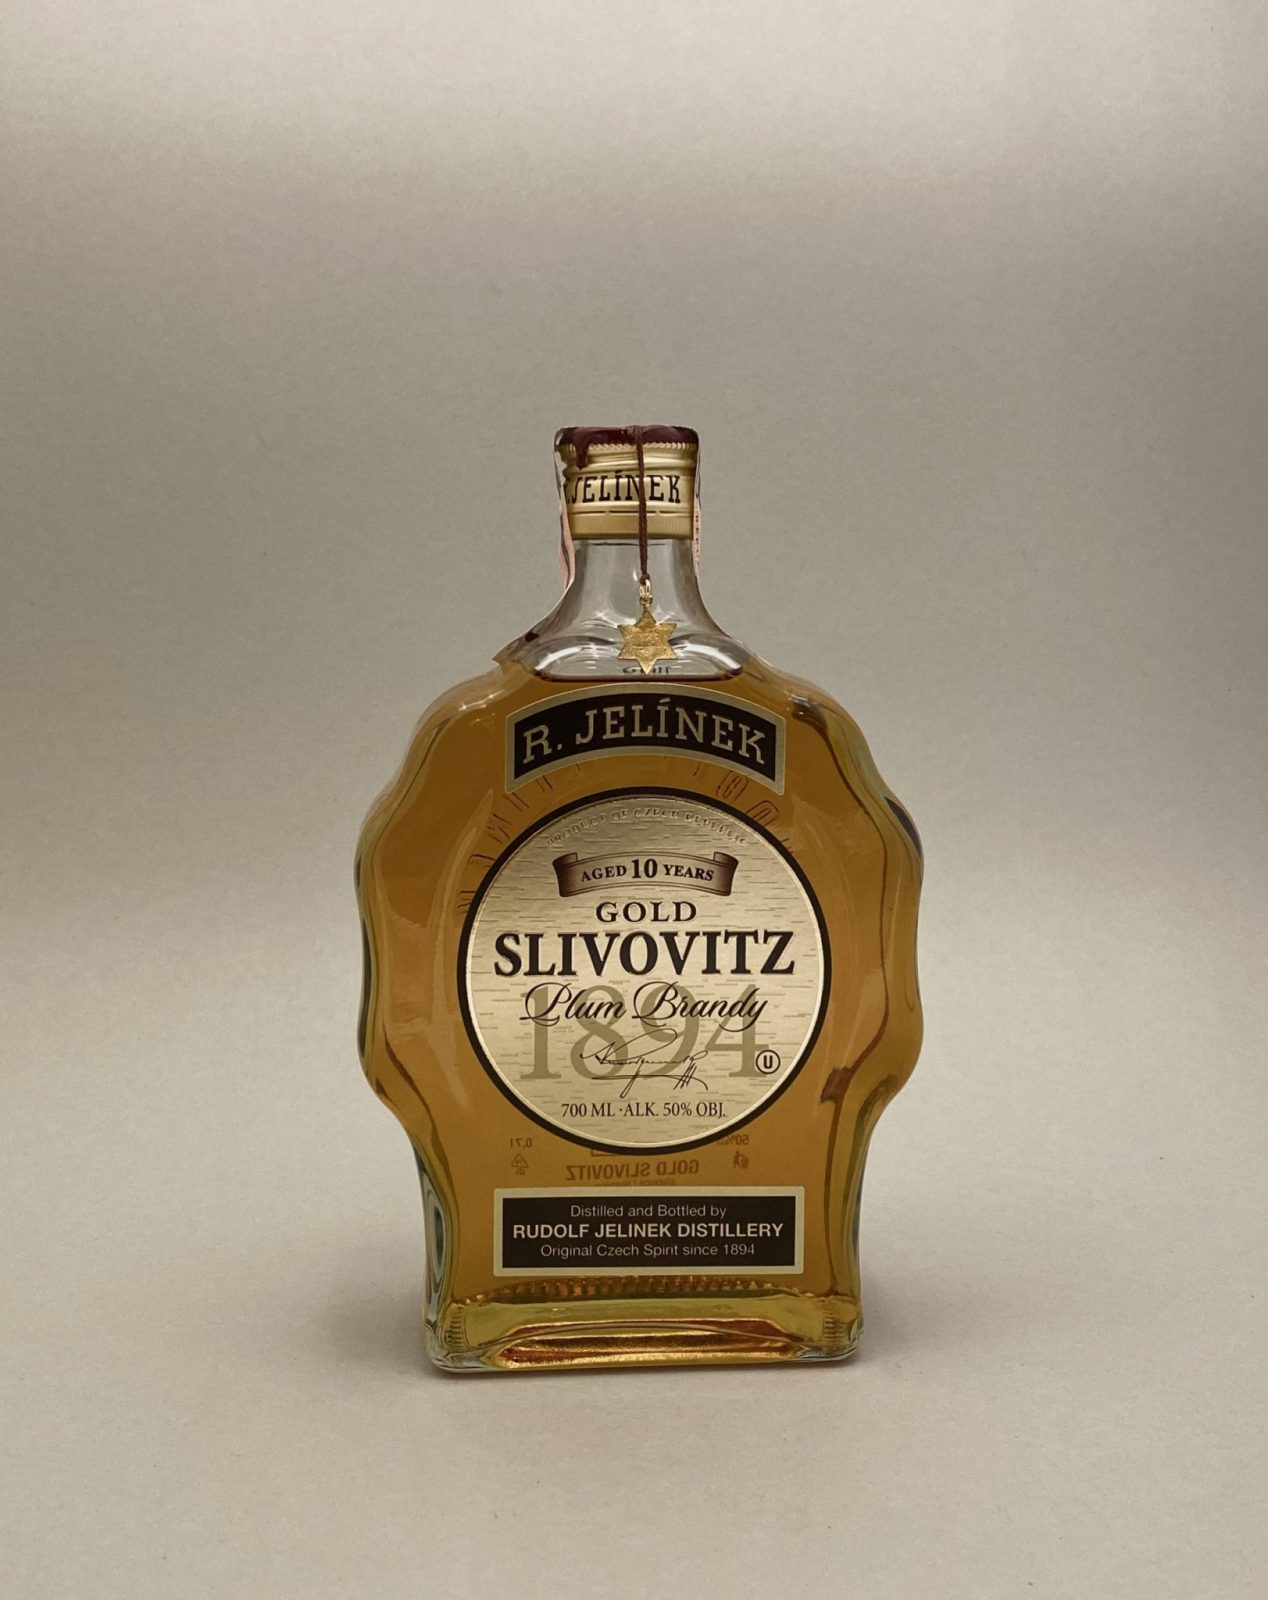 R. Jelínek Slivovitz Kosher Zlatá 50%, Bottleshop Sunny wines slnecnice mesto, petrzalka, destiláty, rozvoz alkoholu, eshop